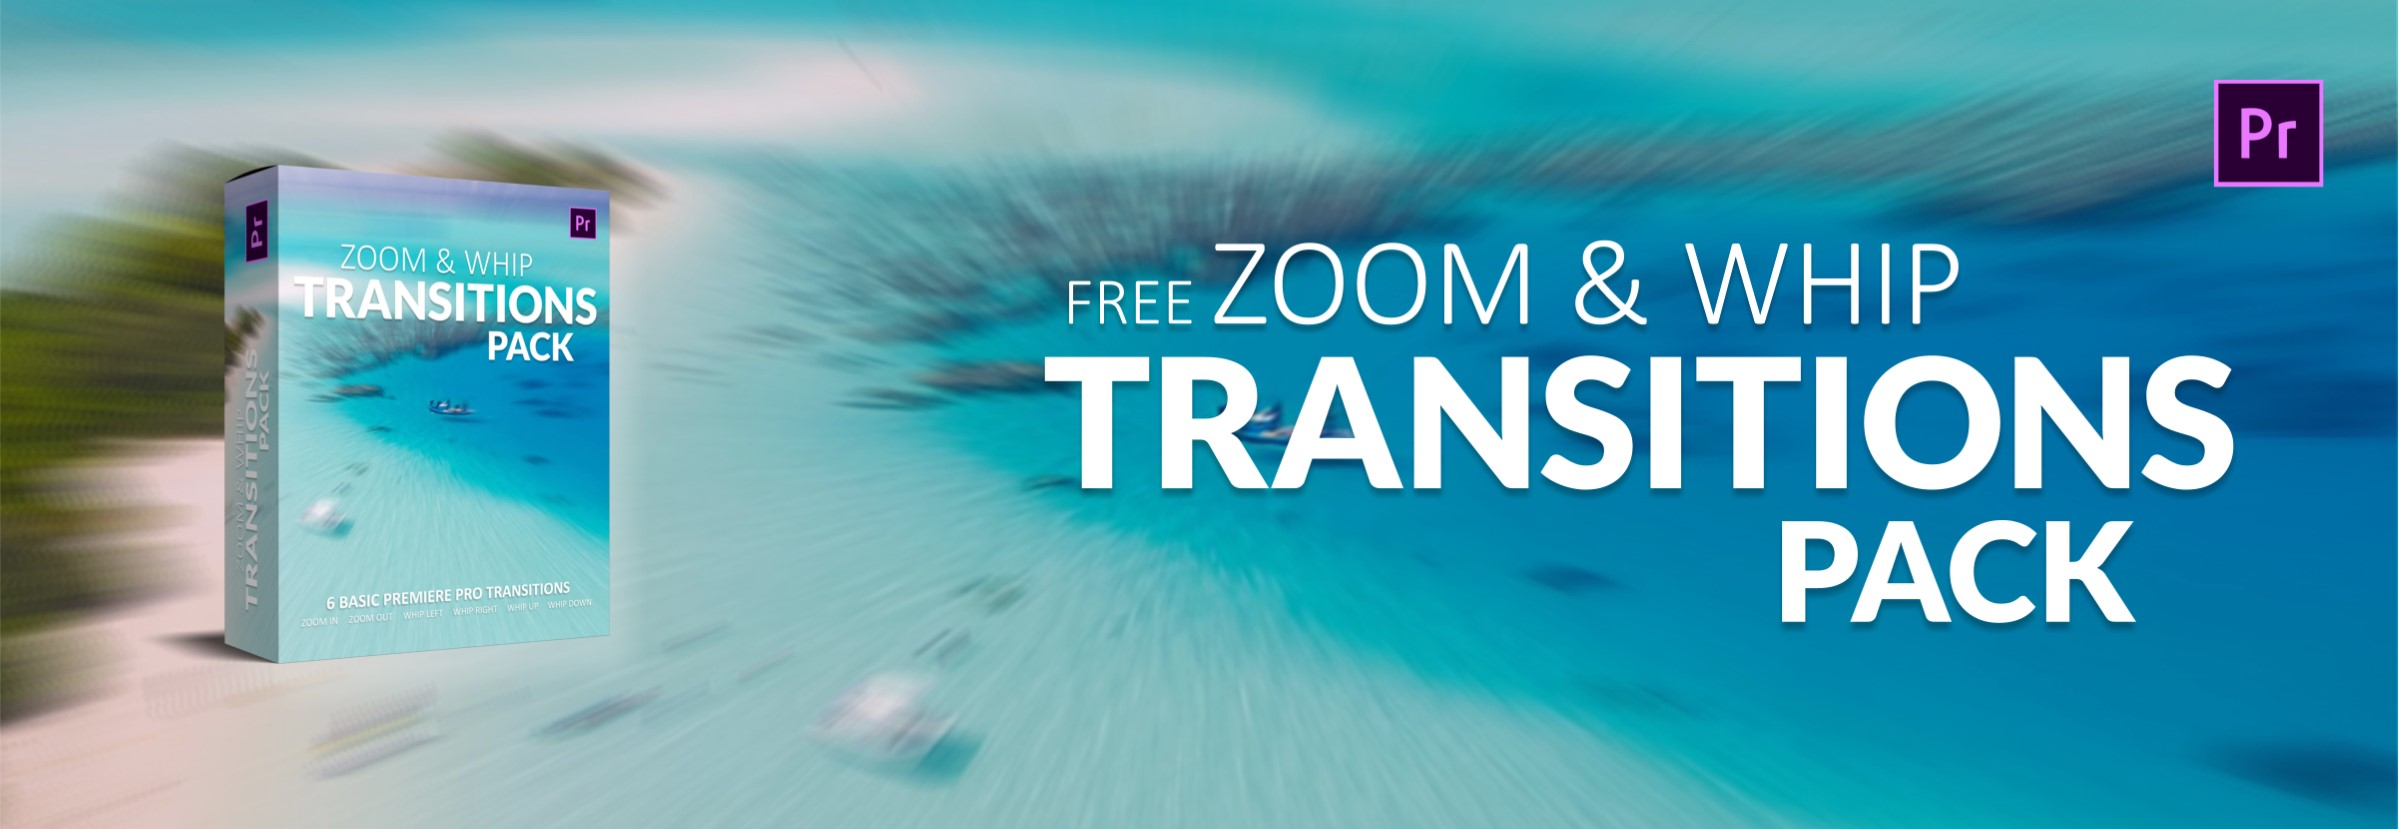 Premiere Pro Zoom Transition Preset DOWNLOAD | Sascha Ohde